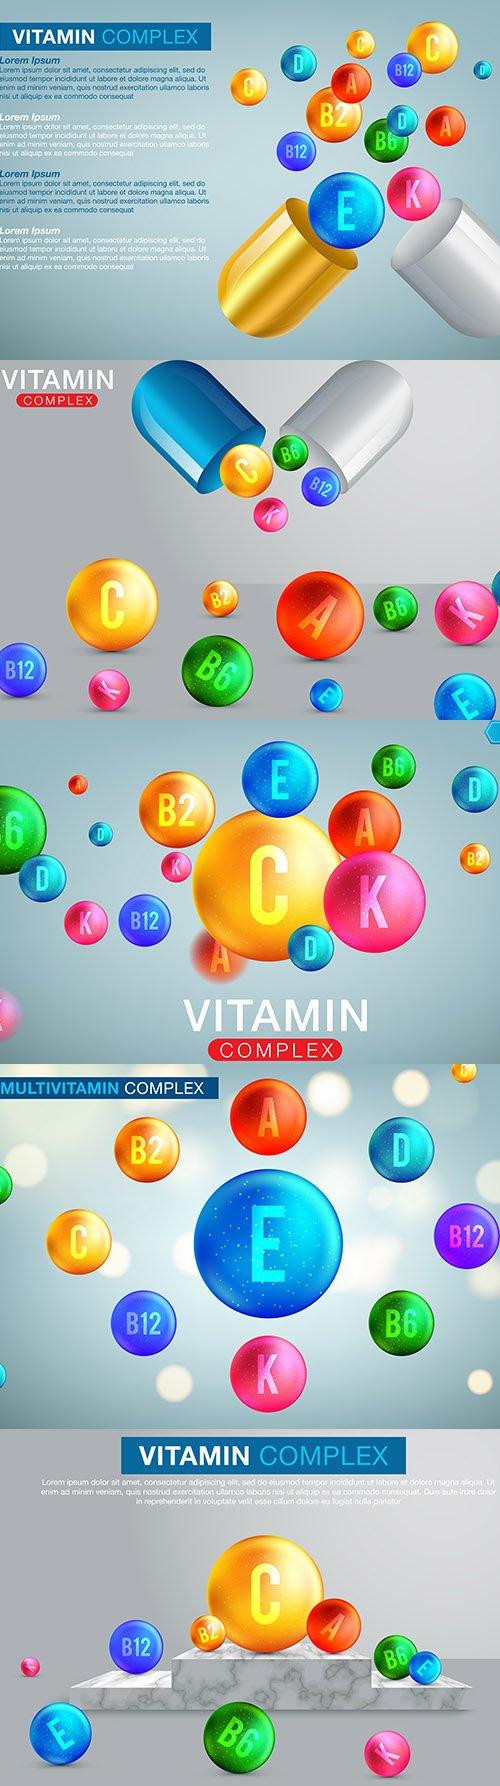 Vitamin Mineral Complex Banner Set